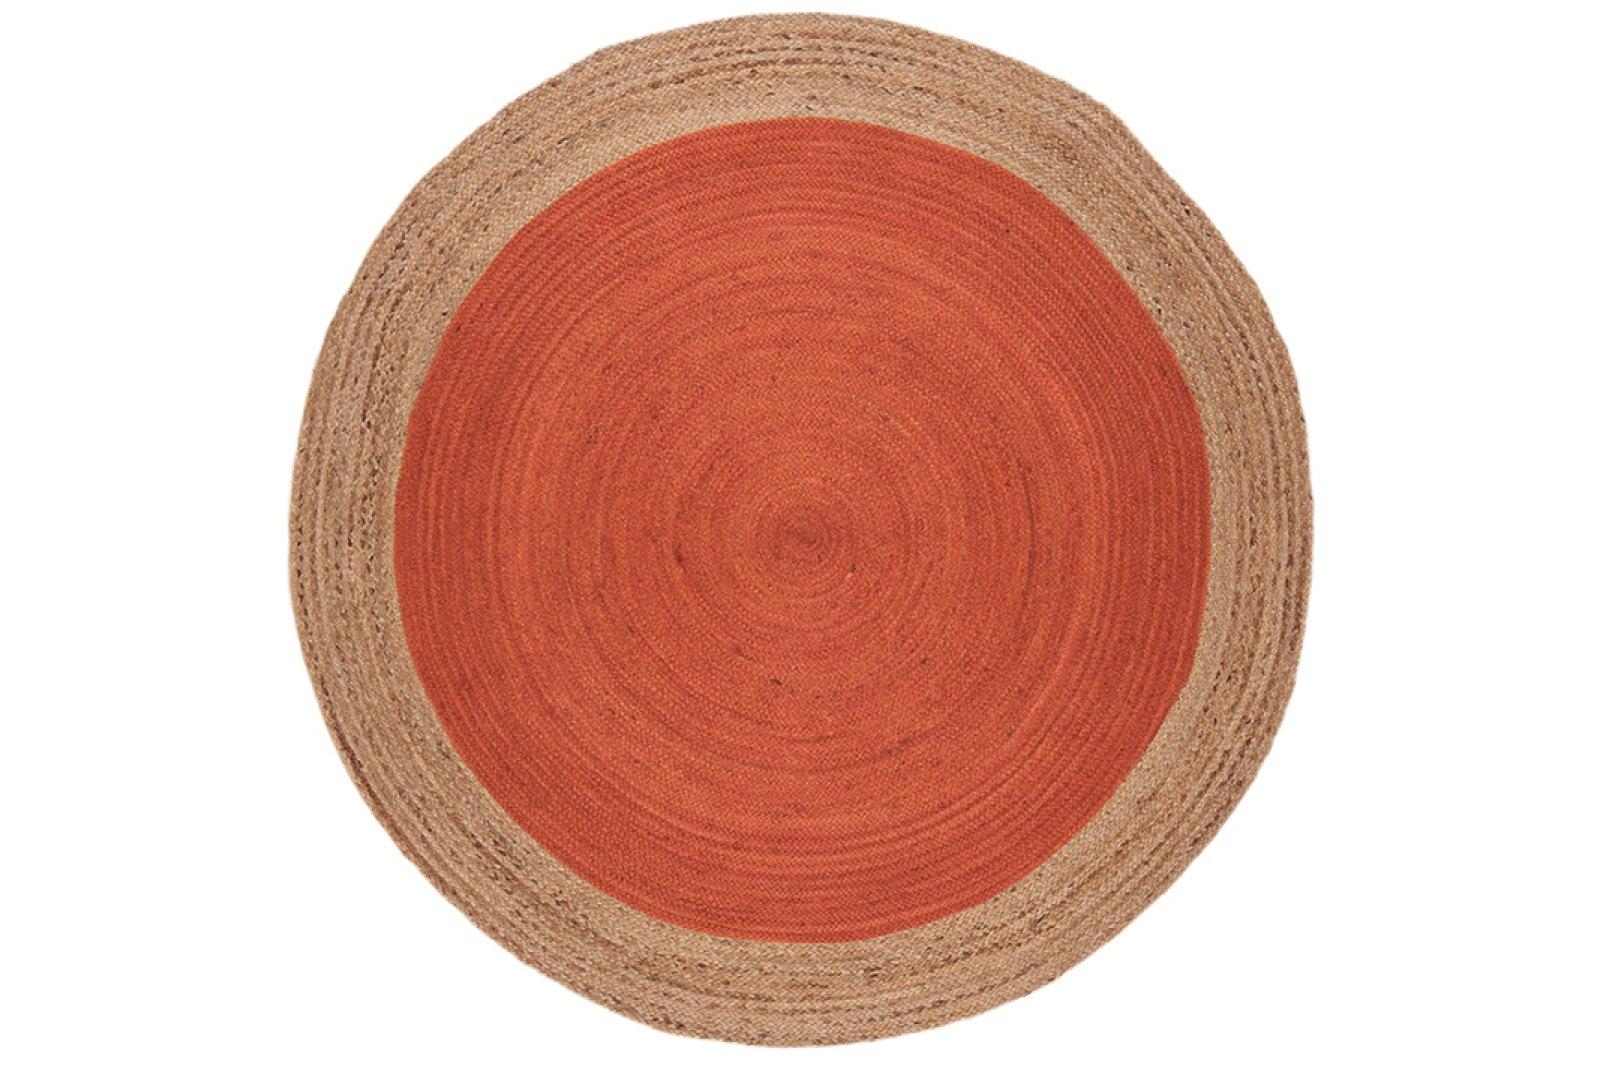 Eivissa Round Jute Rug 160x160cm  / 1